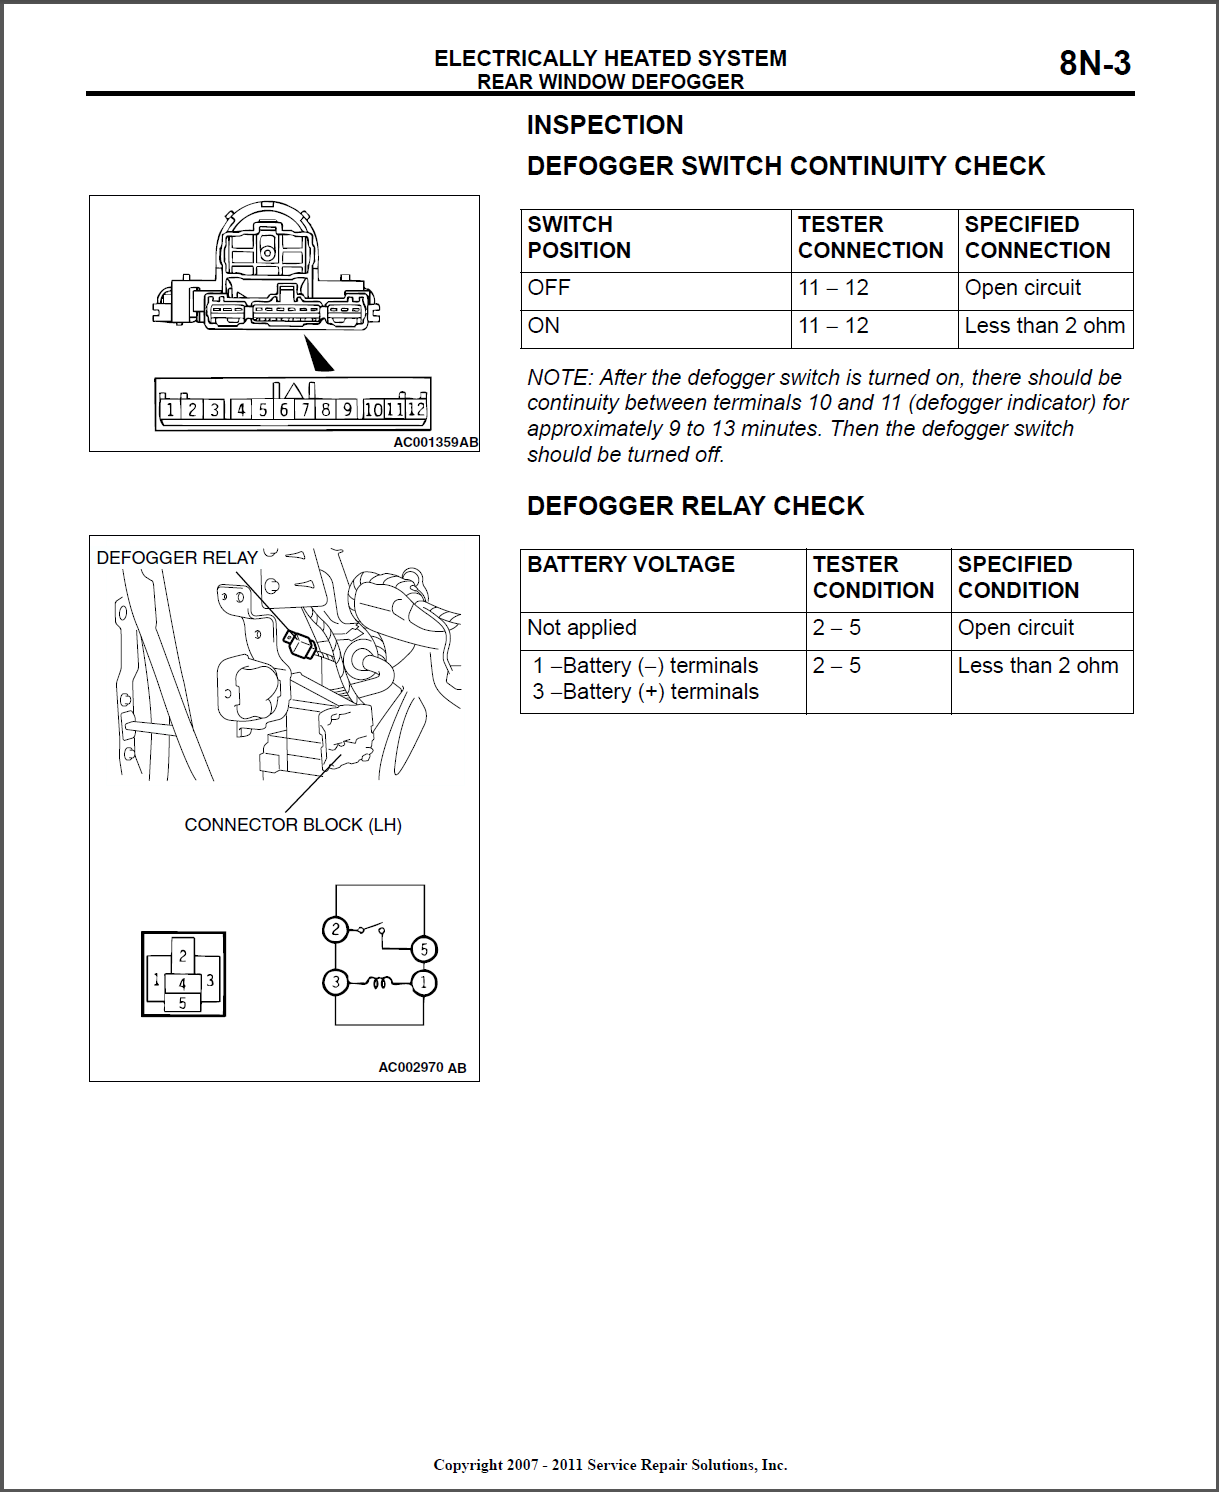 wiring diagram 1975 kenworth k100 cbe9186 2002 sebring power window switch wiring diagram wiring  switch wiring diagram wiring